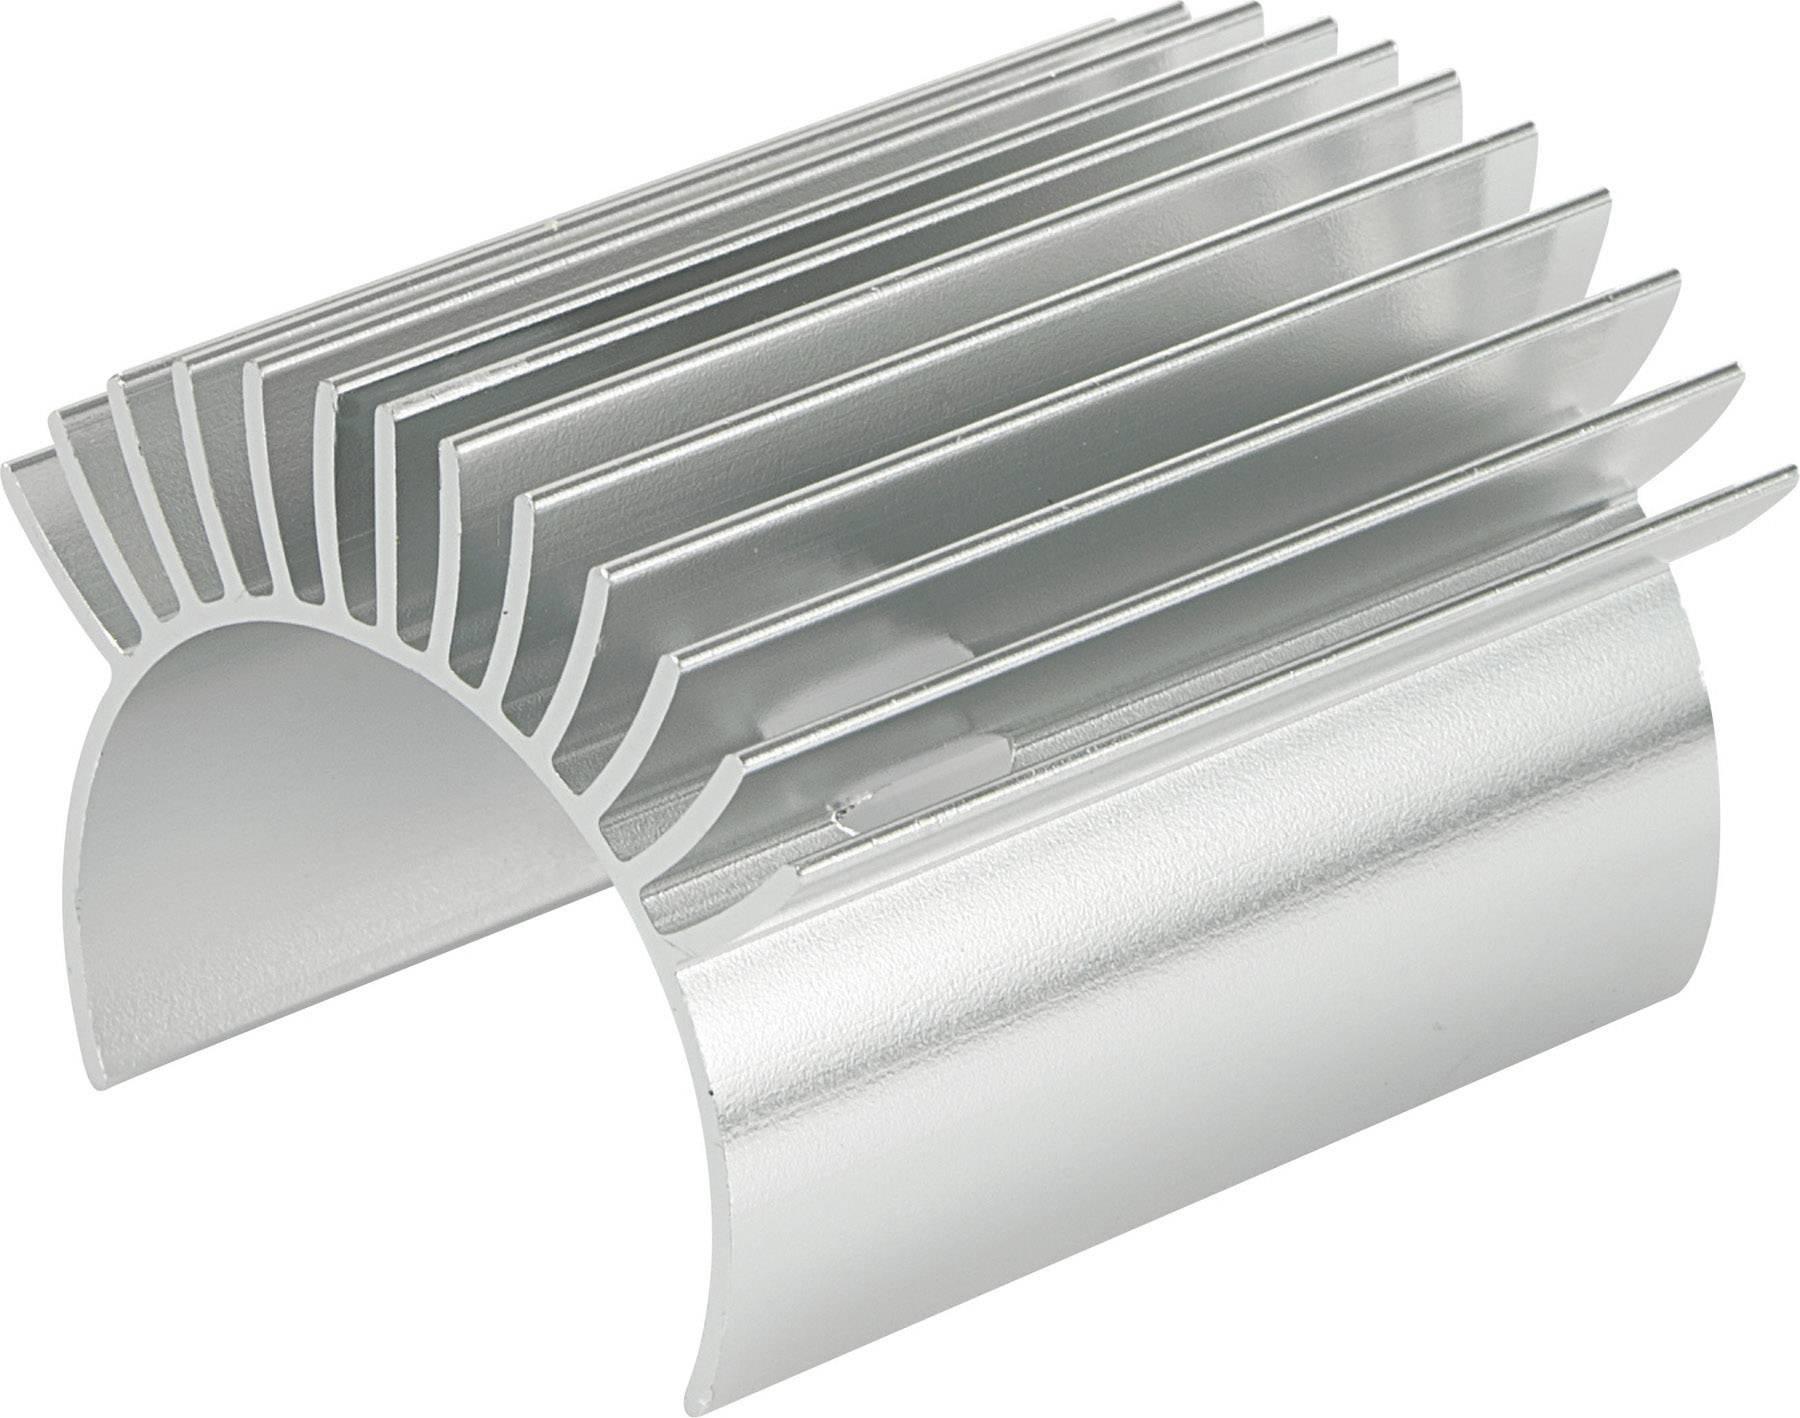 Hliníkový chladič Reely Extreme, 48 mm, stříbrná